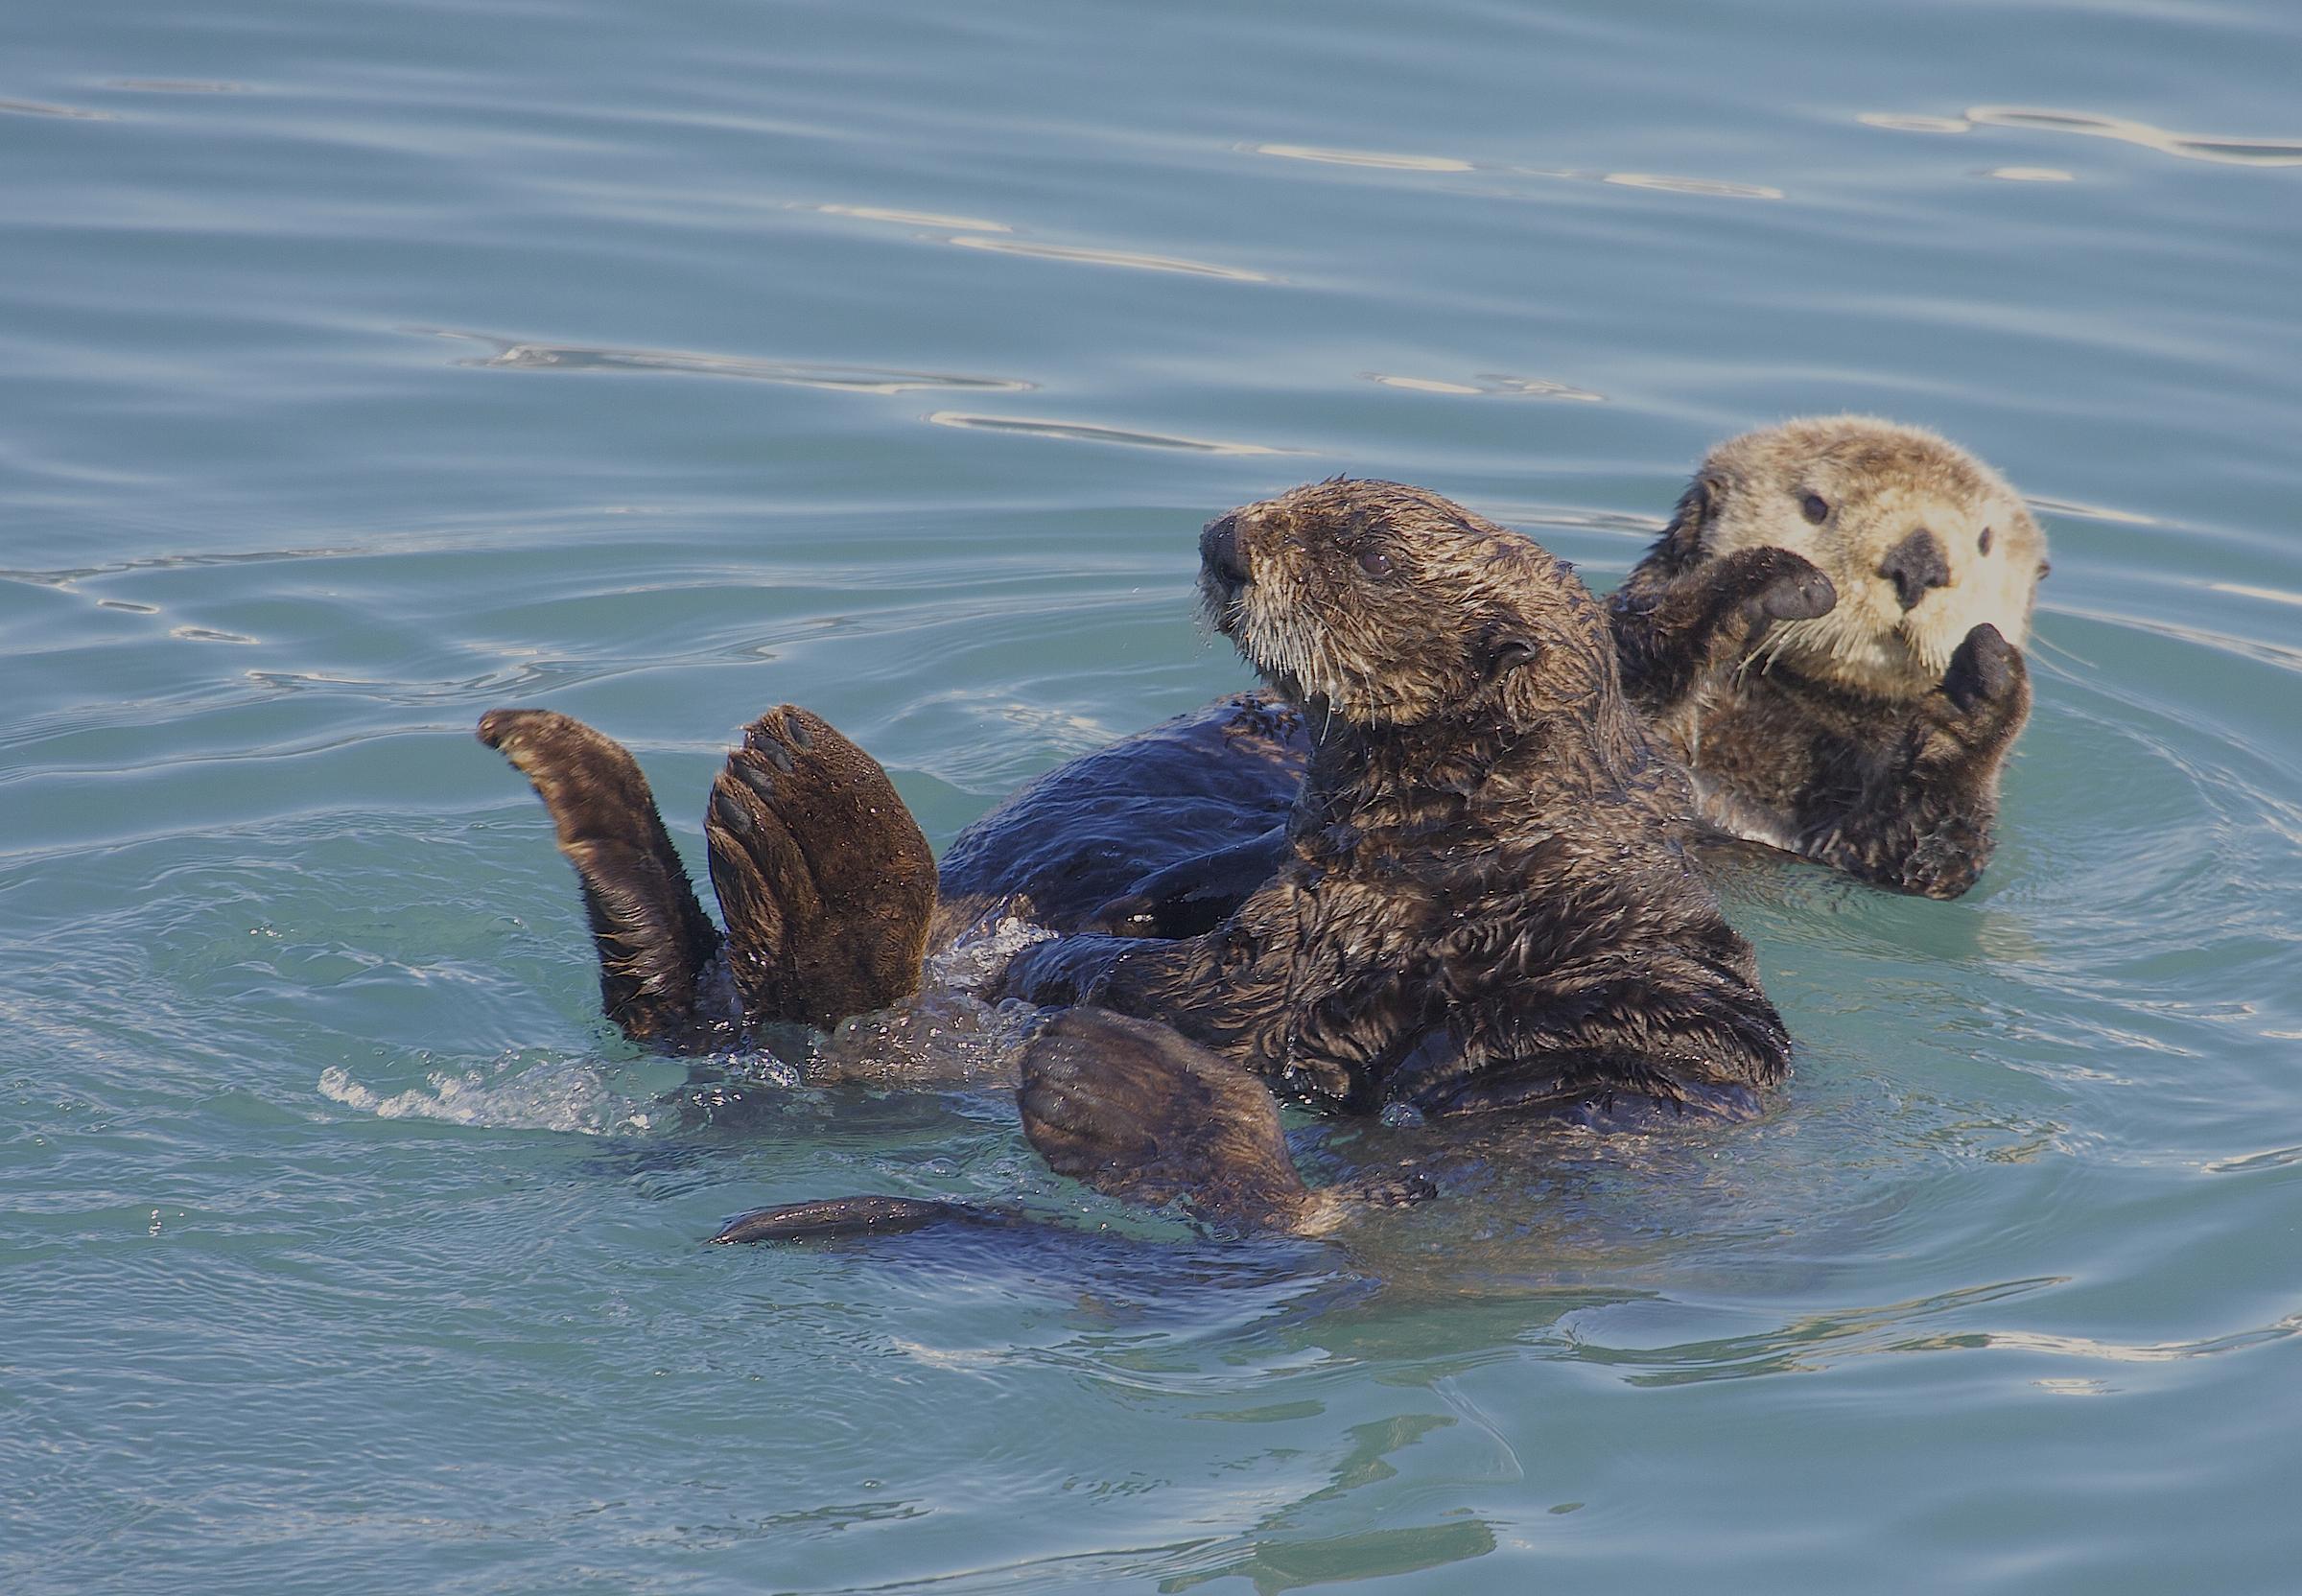 File:Northern Sea Otter (Enhydra lutris) (9674678457) jpg